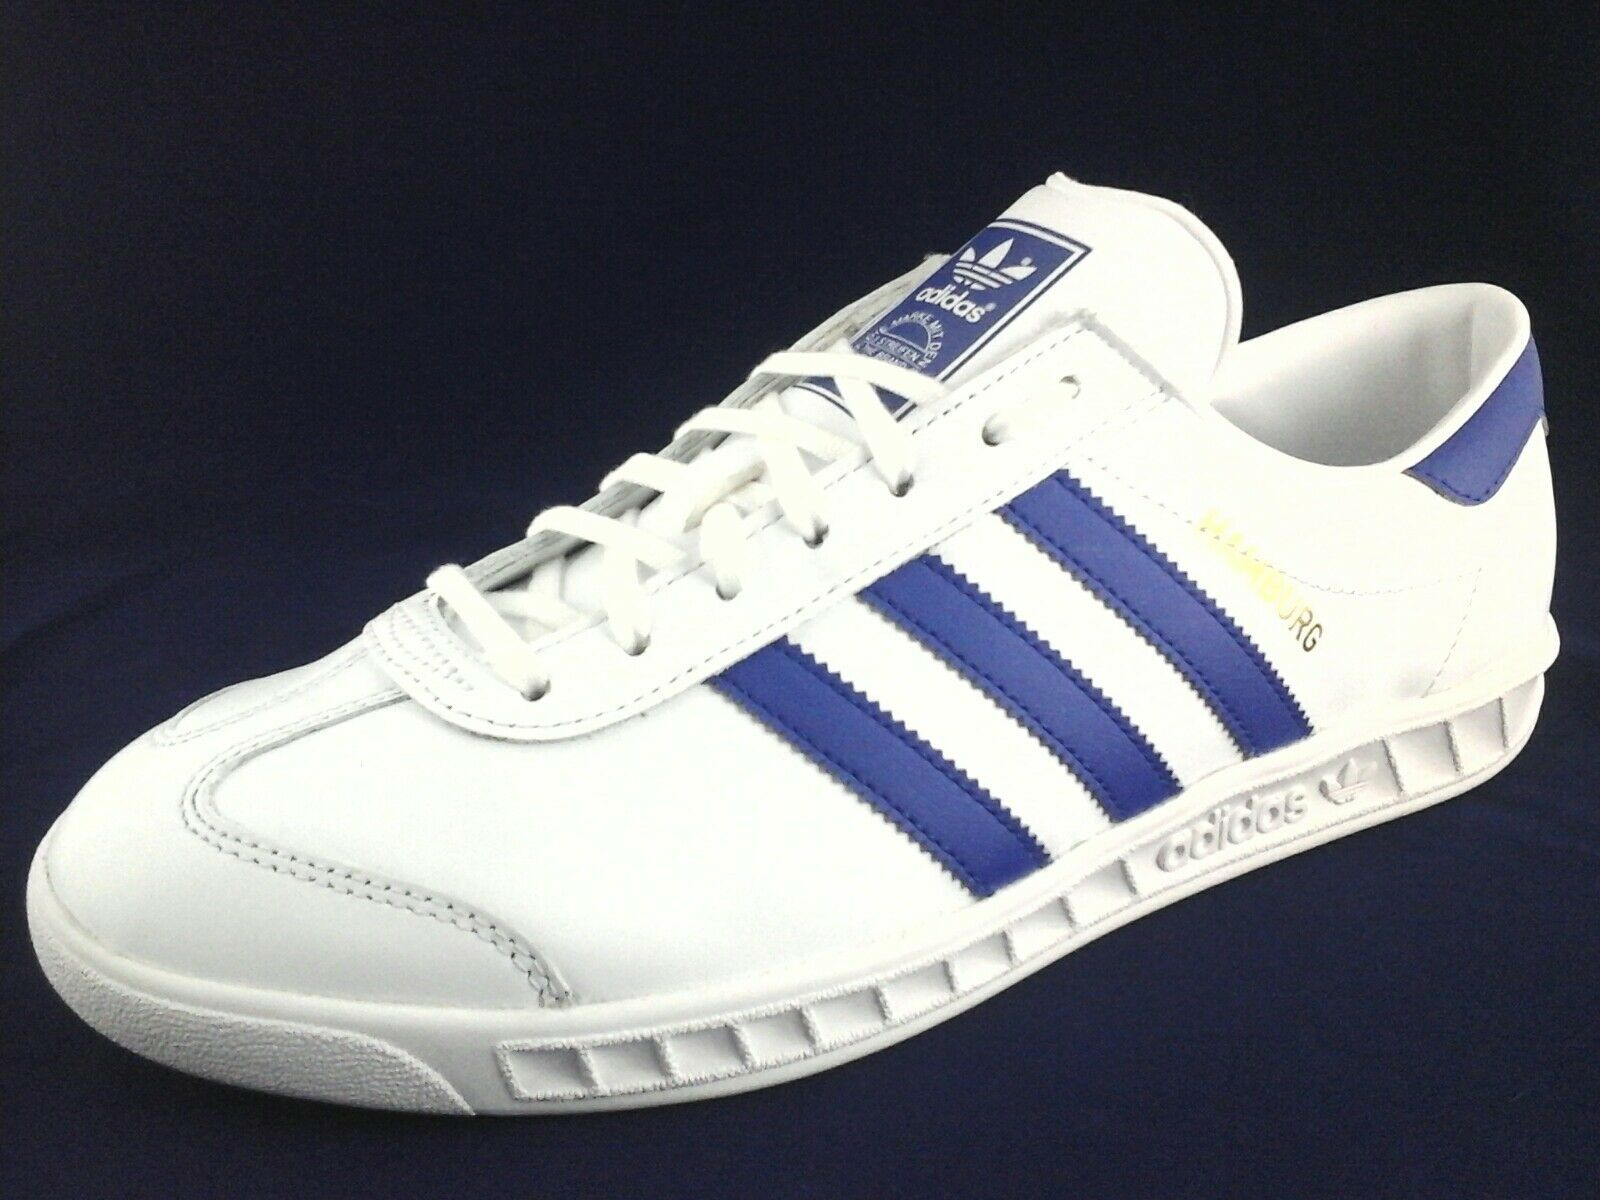 Adidas Originals Hamburg Ortholite Mens Shoes White Blue BY9758 10, 10.5 New